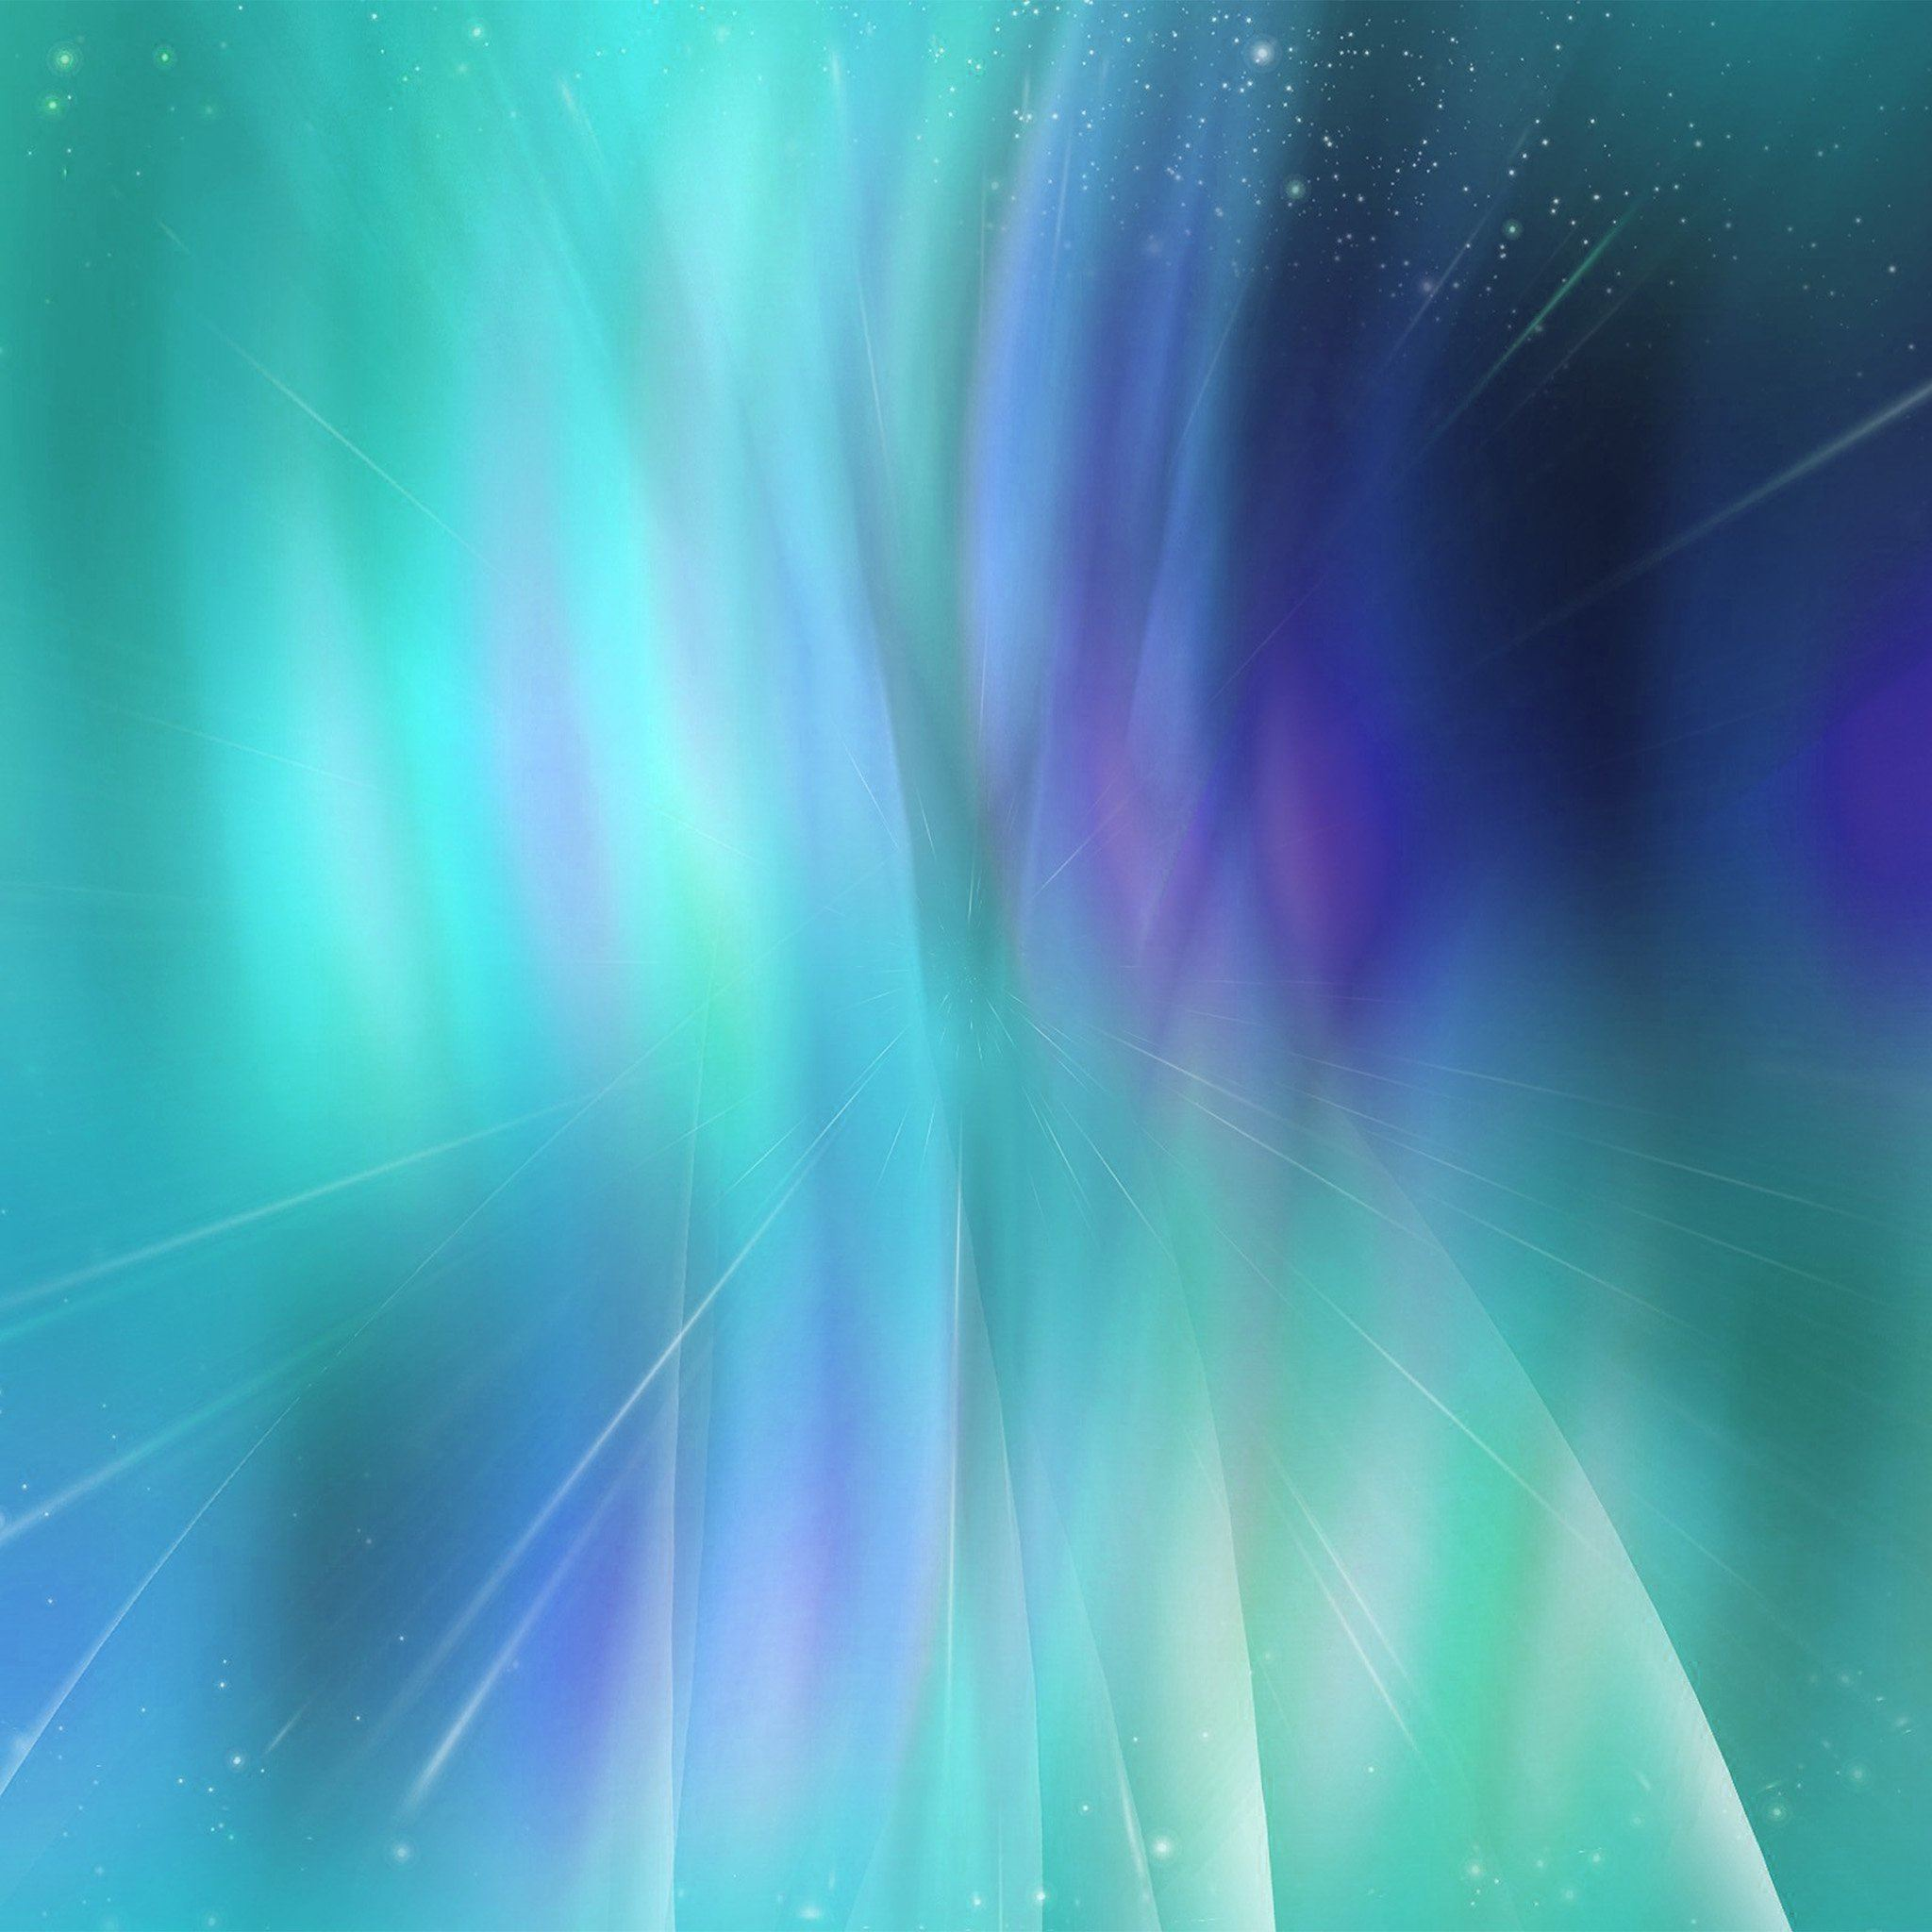 Fantasy Green Blue Abstract Pattern IPad Air Wallpapers